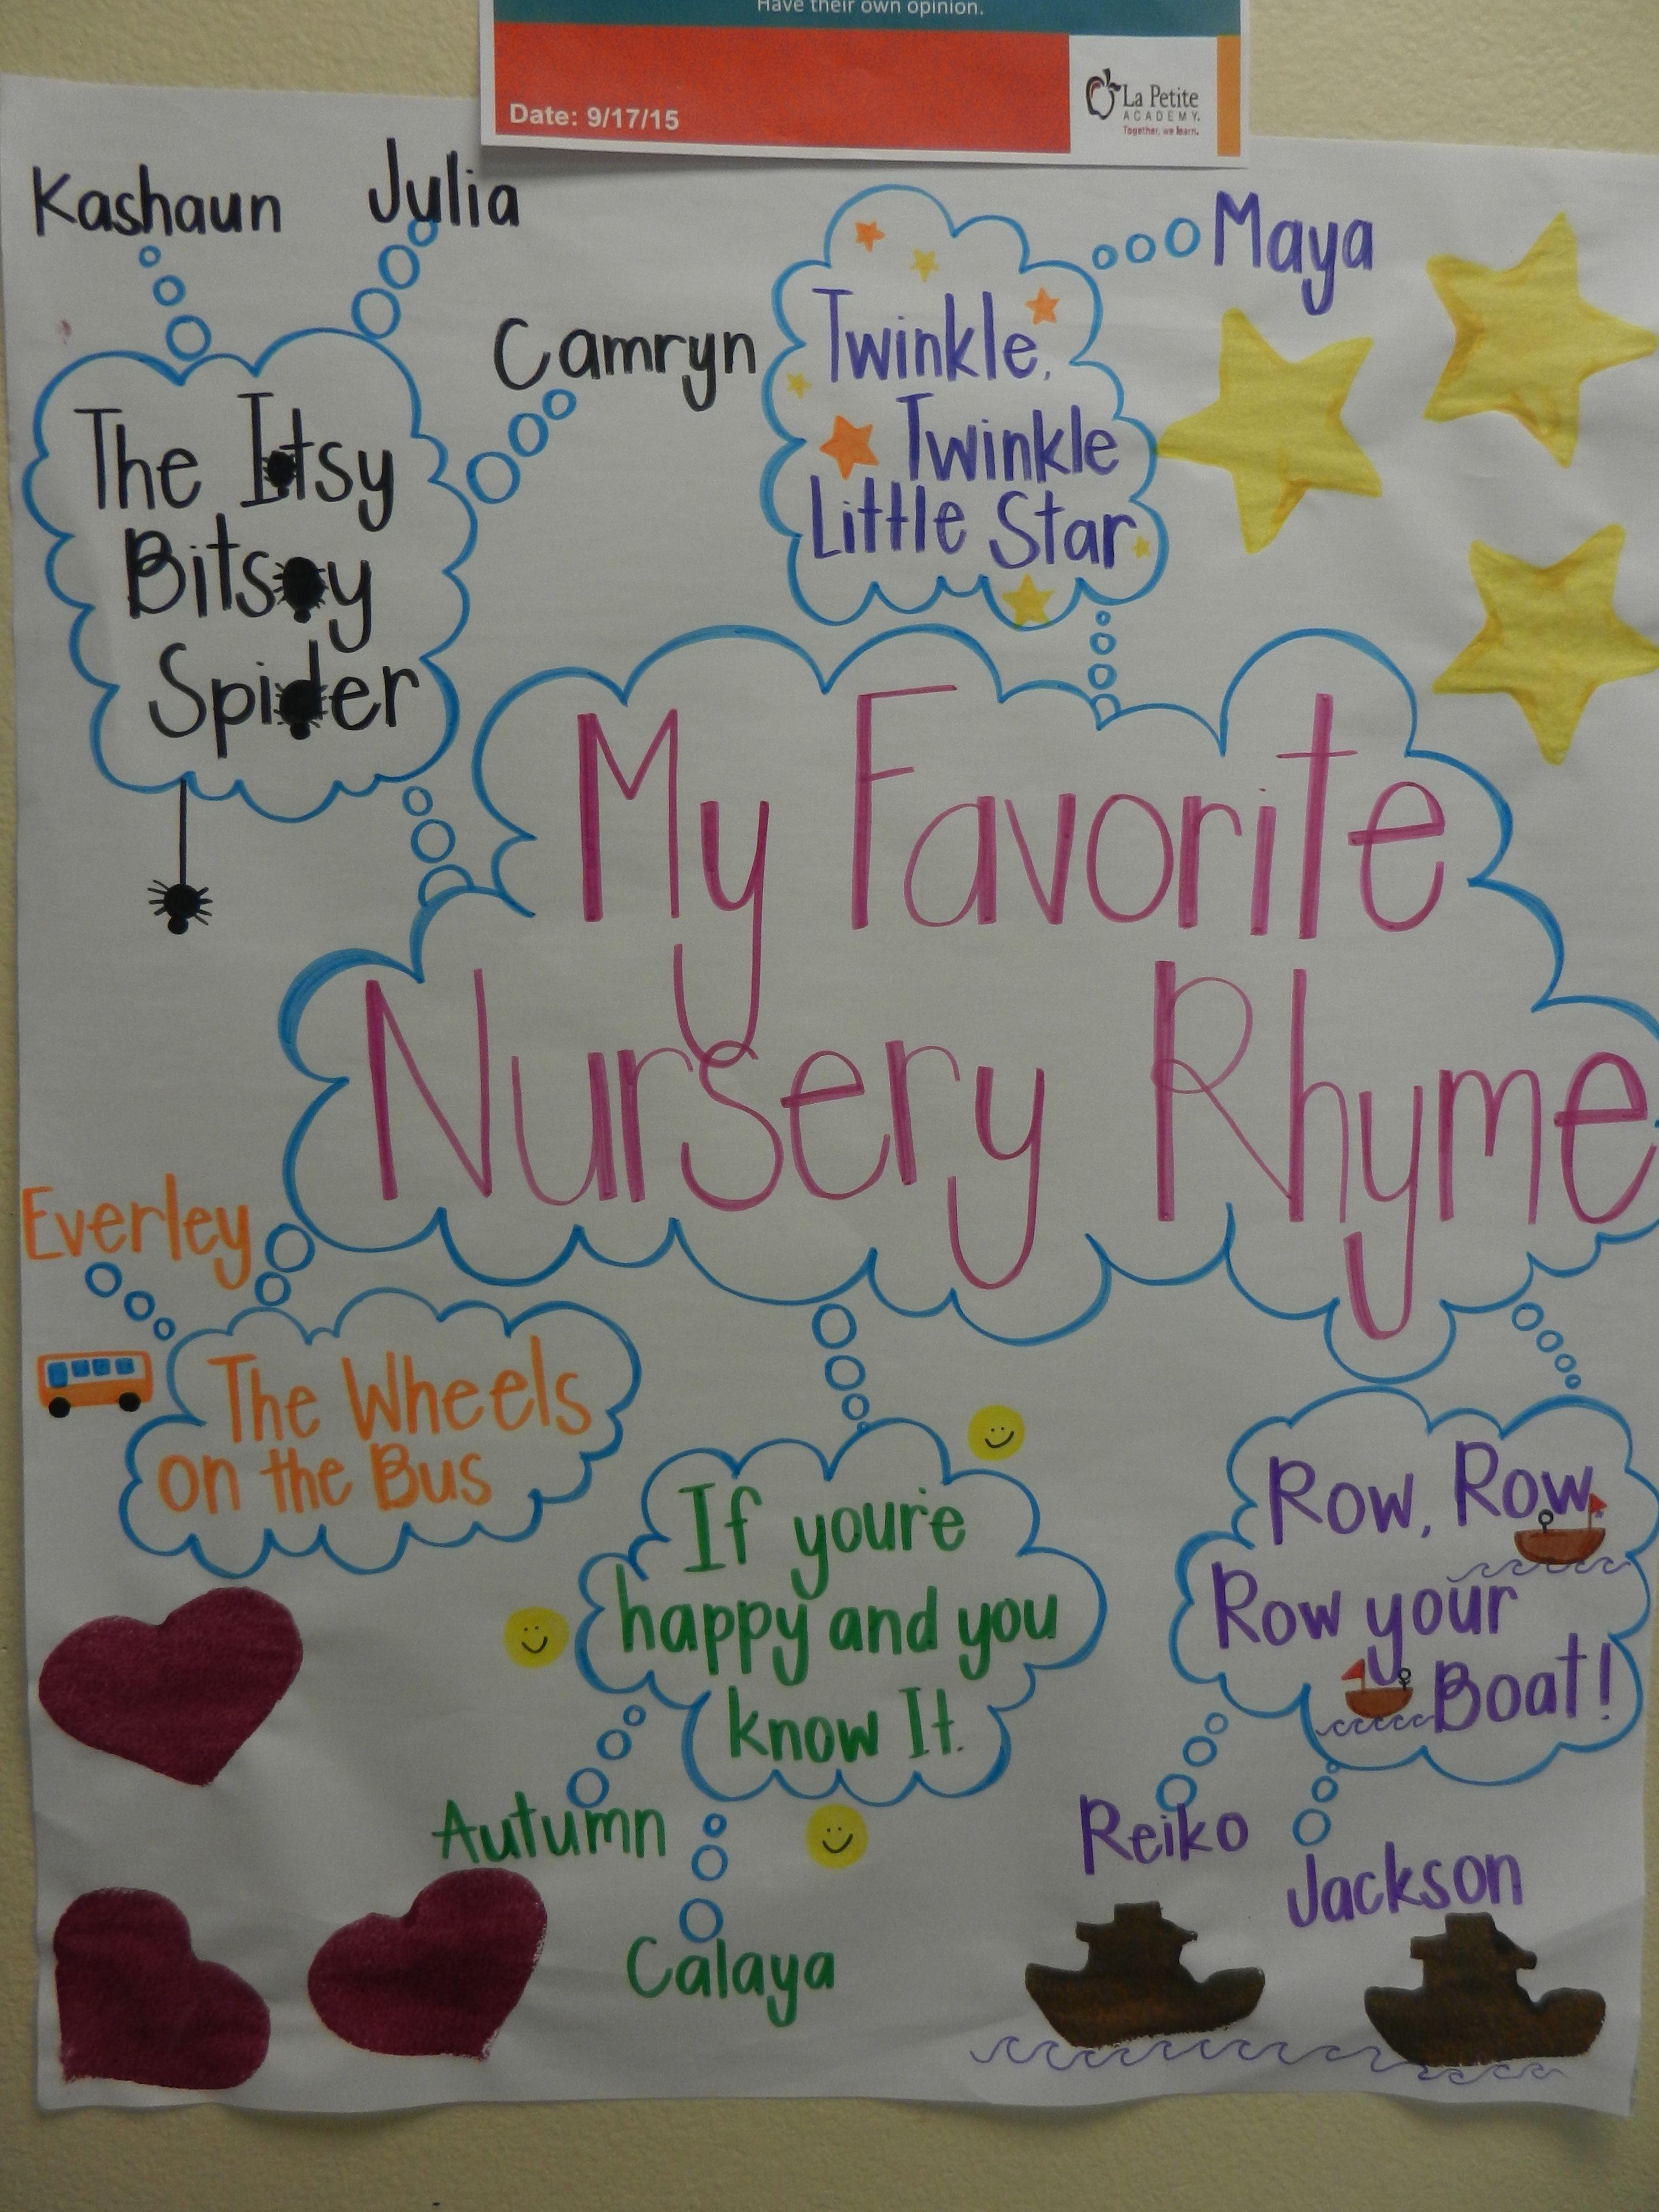 What Is Your Favorite Nursery Rhyme